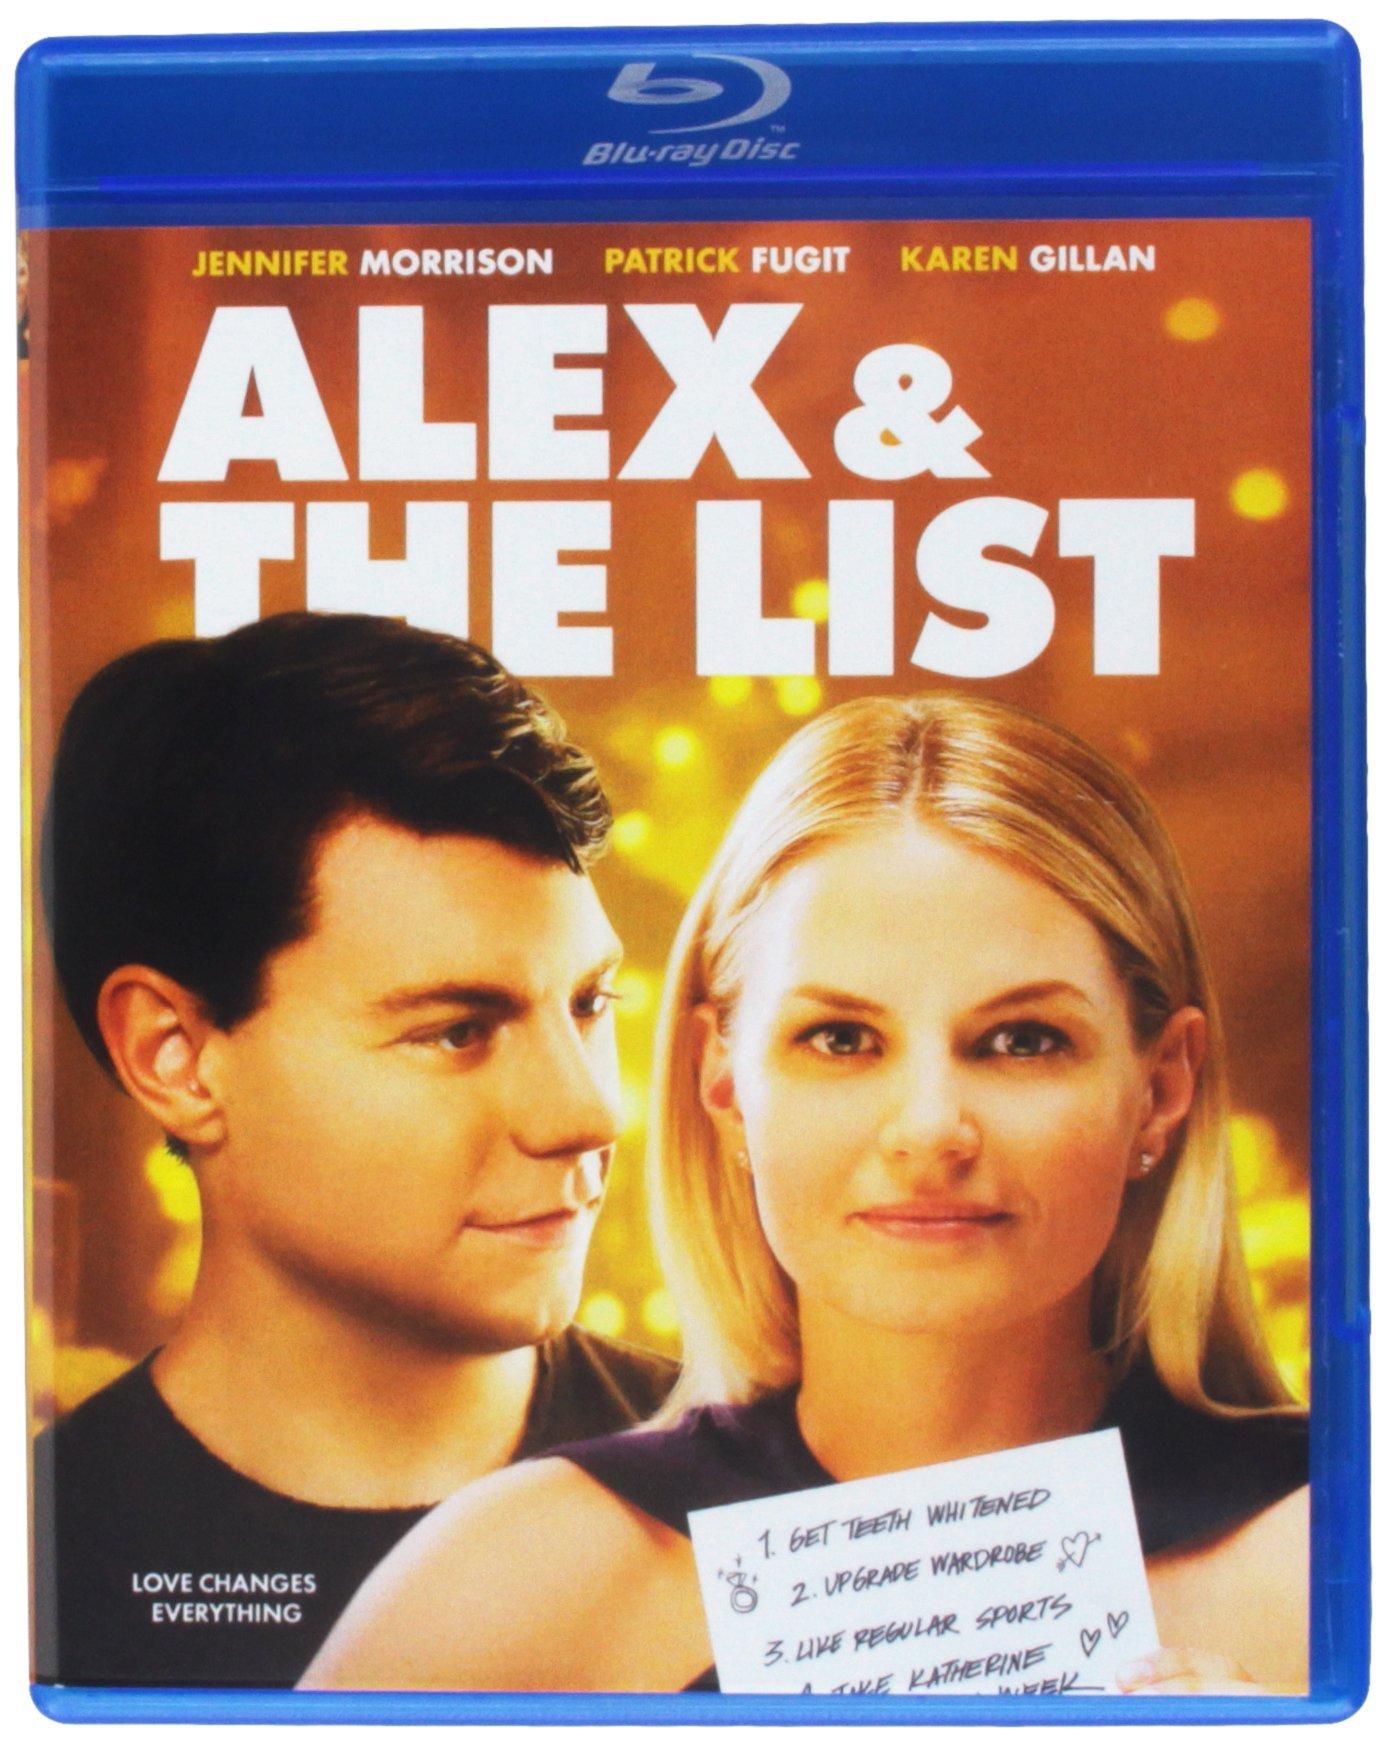 Blu-ray : Alex & The List (Blu-ray)